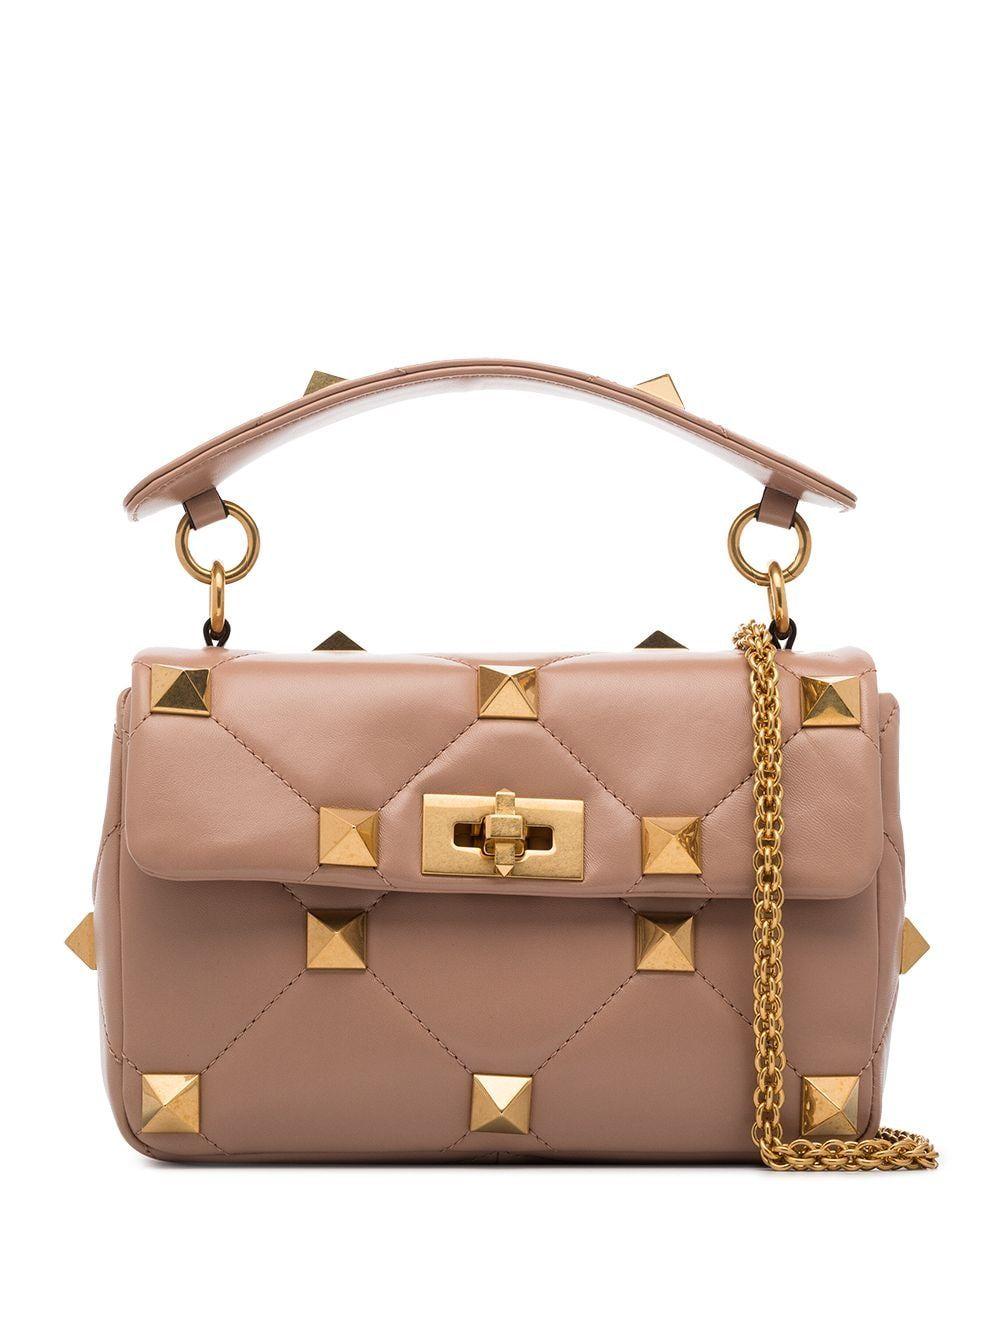 Valentino garavani bags.. pink